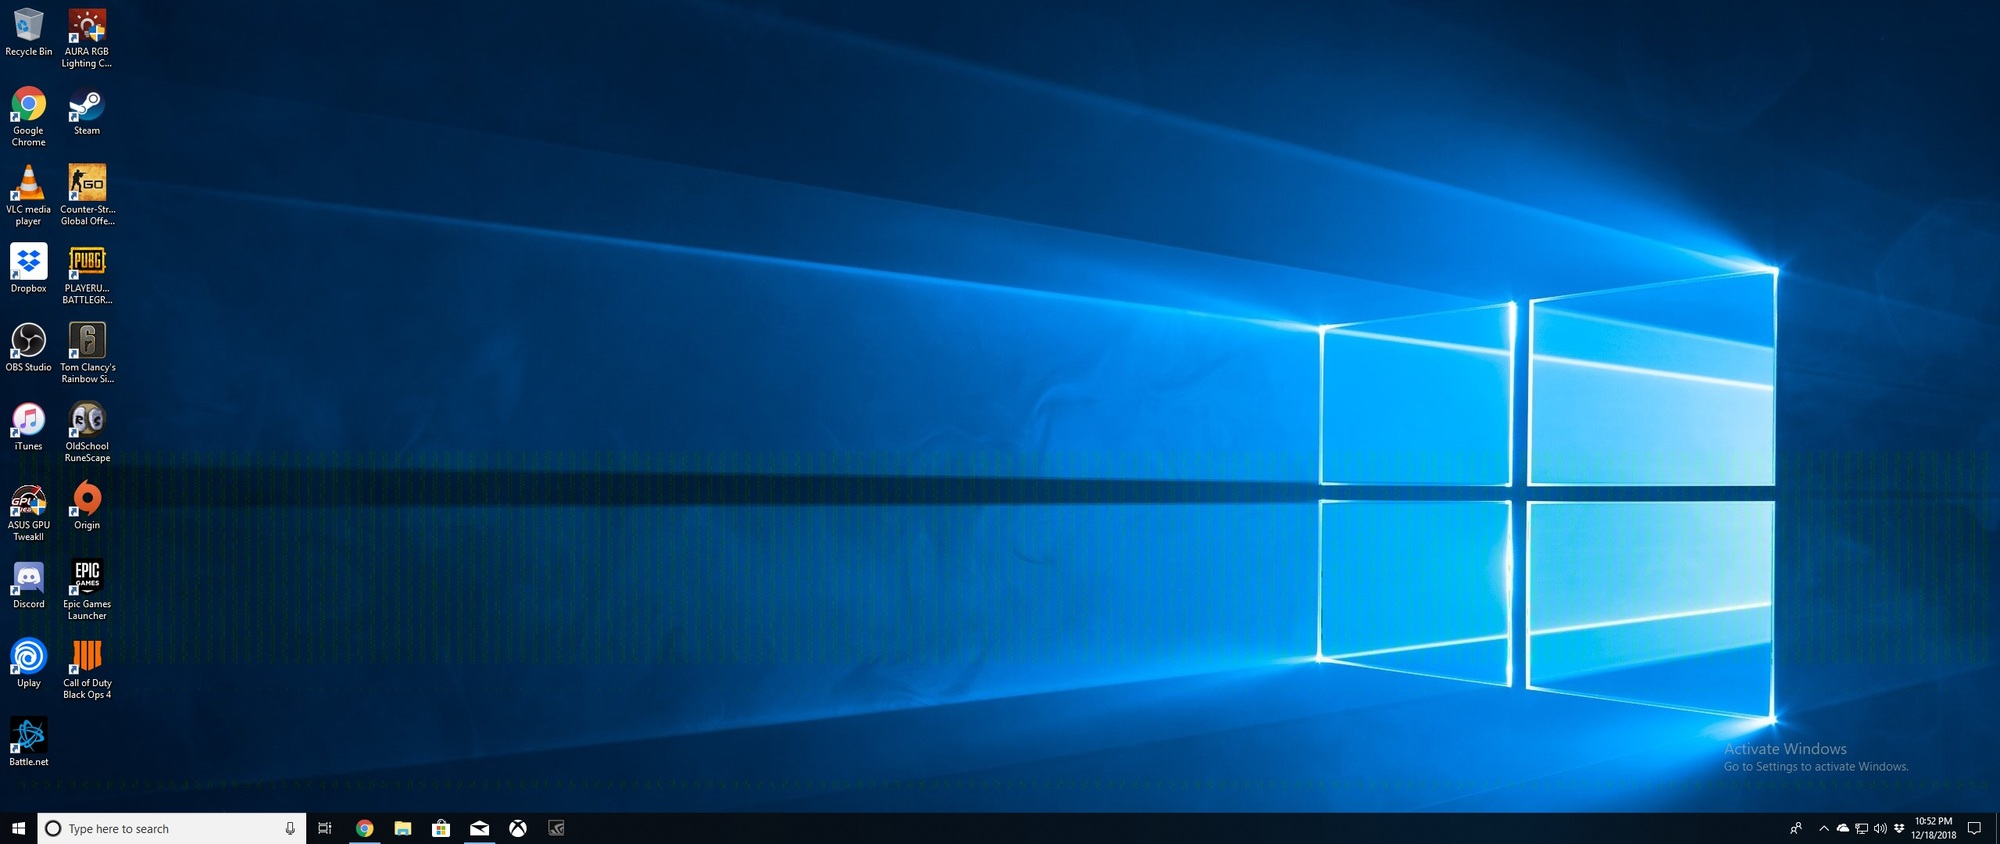 Lines of Green Vertical Pixels Across Desktop Home Screen e8567f35-4651-4d2b-91be-718adcb99fd3?upload=true.jpg